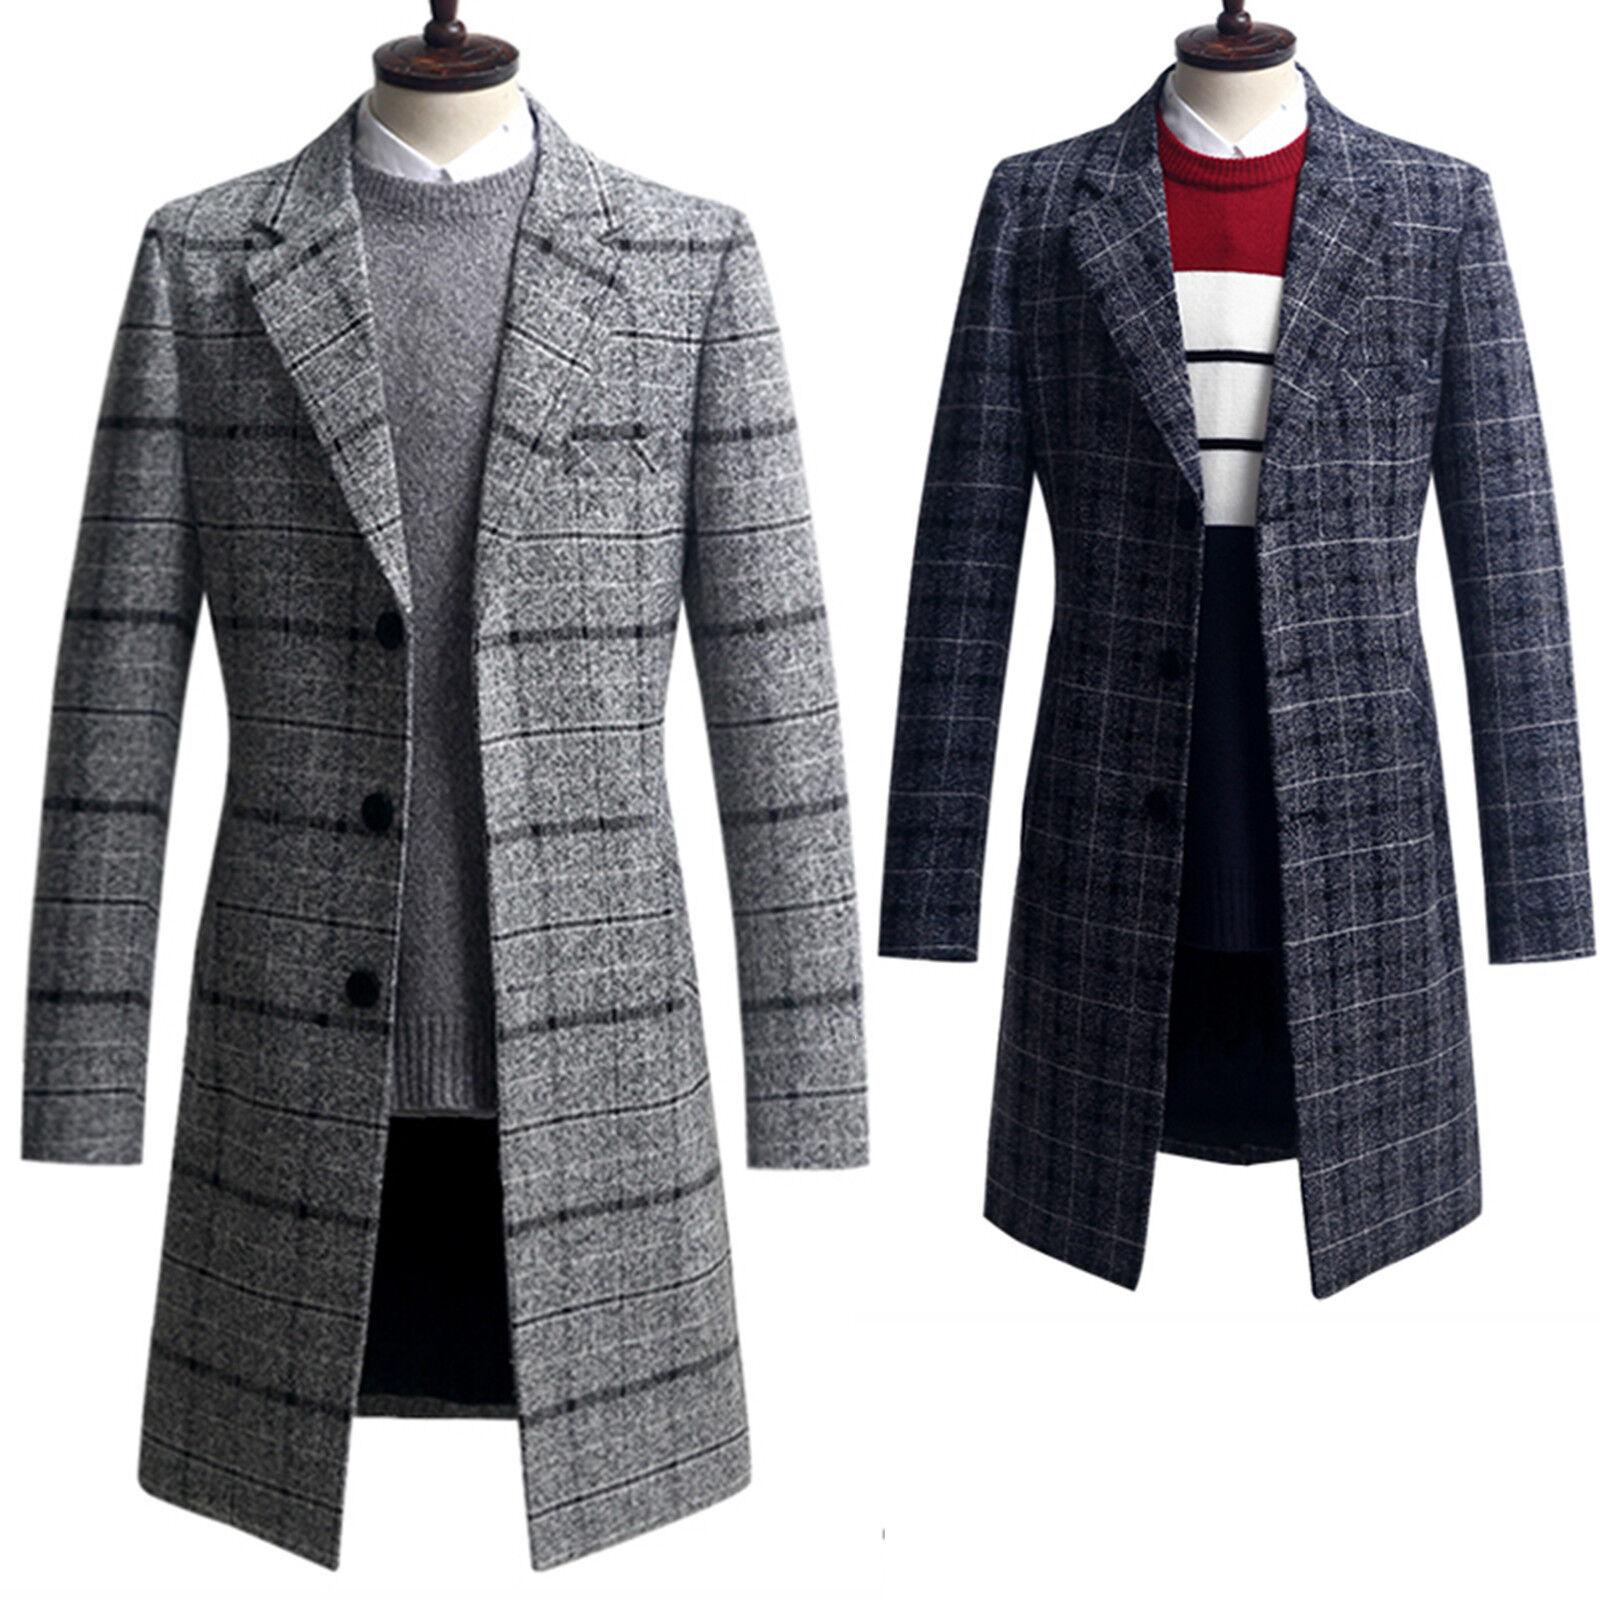 herren Slim Fit verbreitung Check Long Coat Blazer jacke Jumper Outwear Top W012 S M L